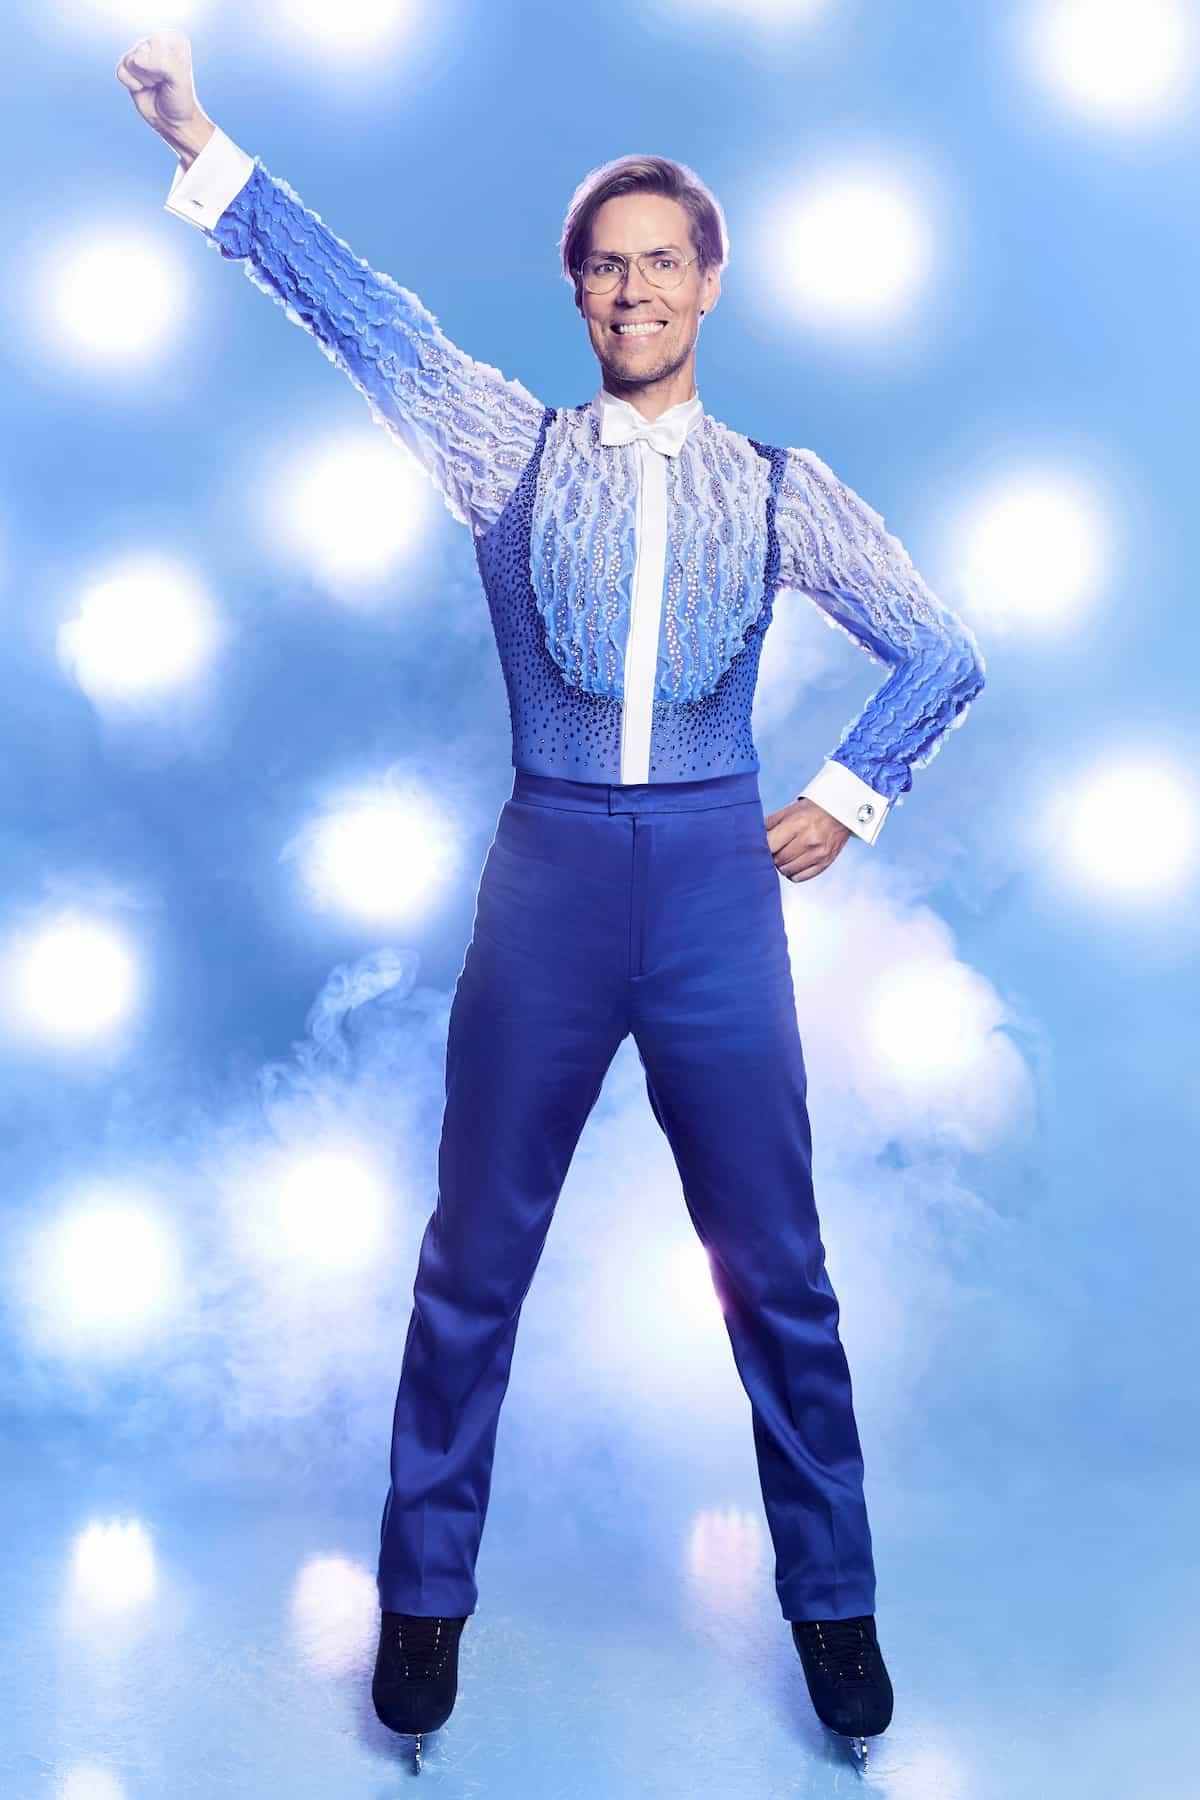 Jens Hilbert Promi-Kandidat Dancing on Ice 2019 Herbst-Winter 2te Staffel